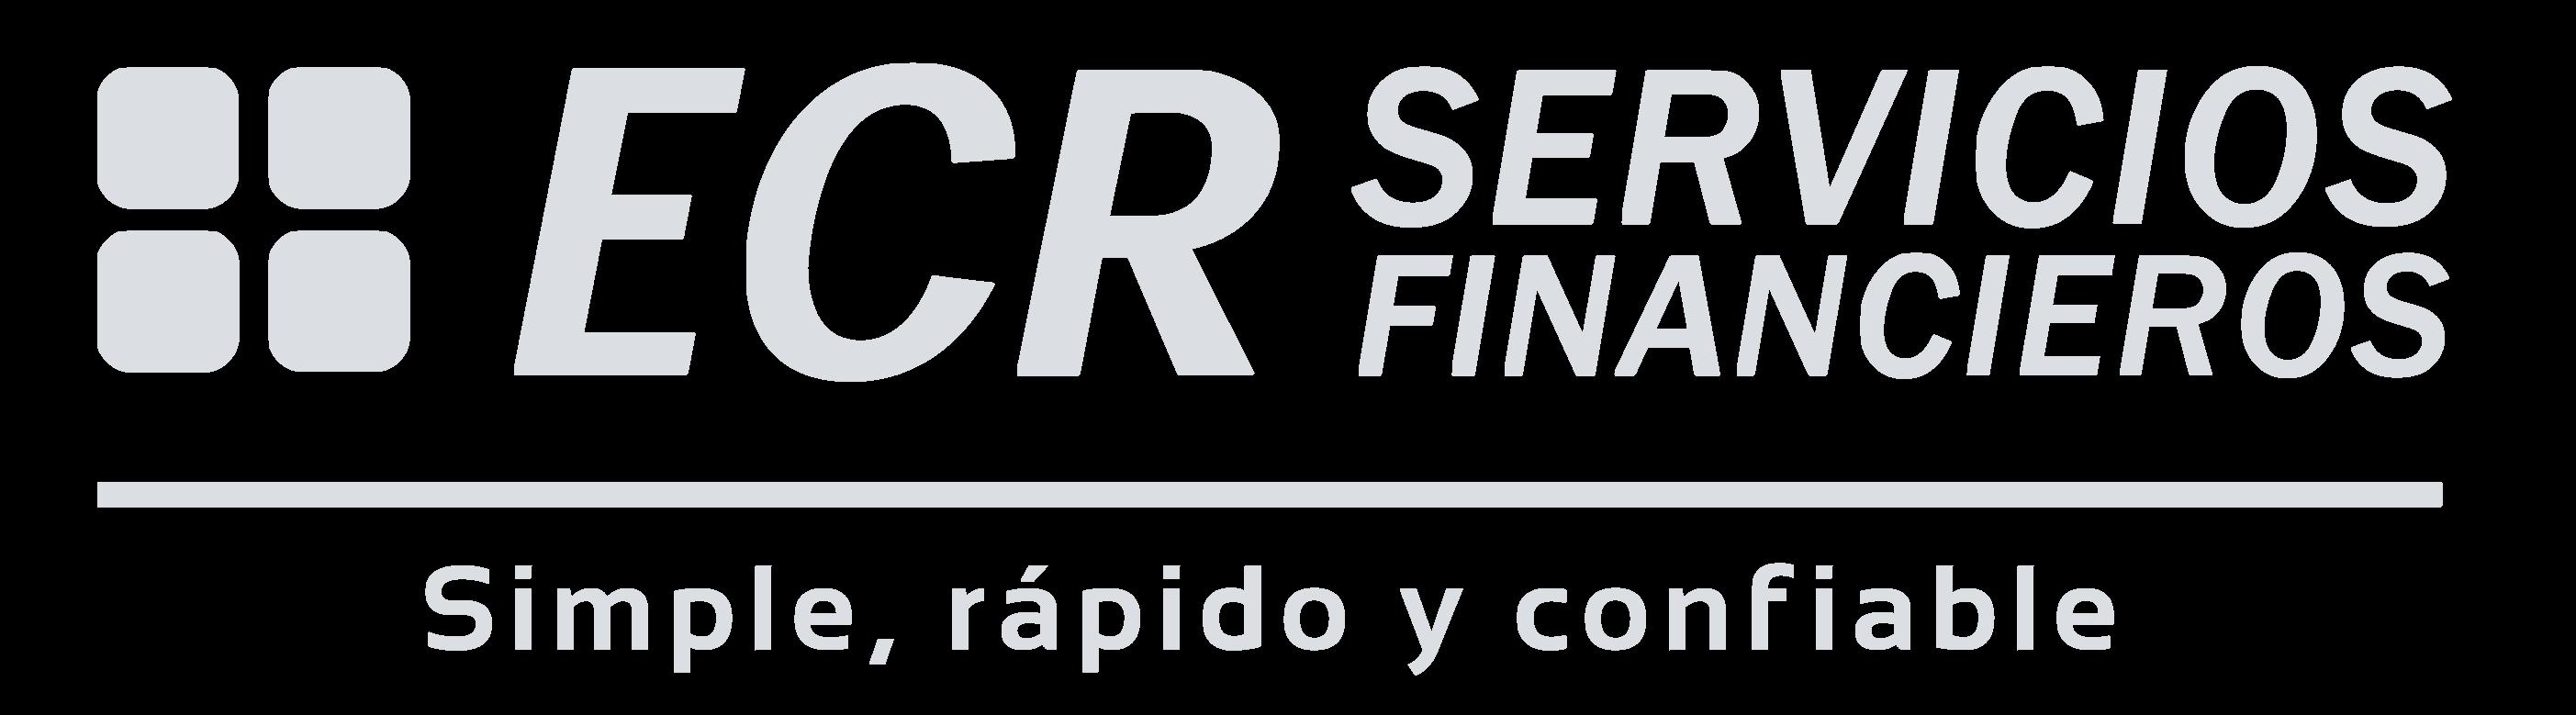 ECR logo gris